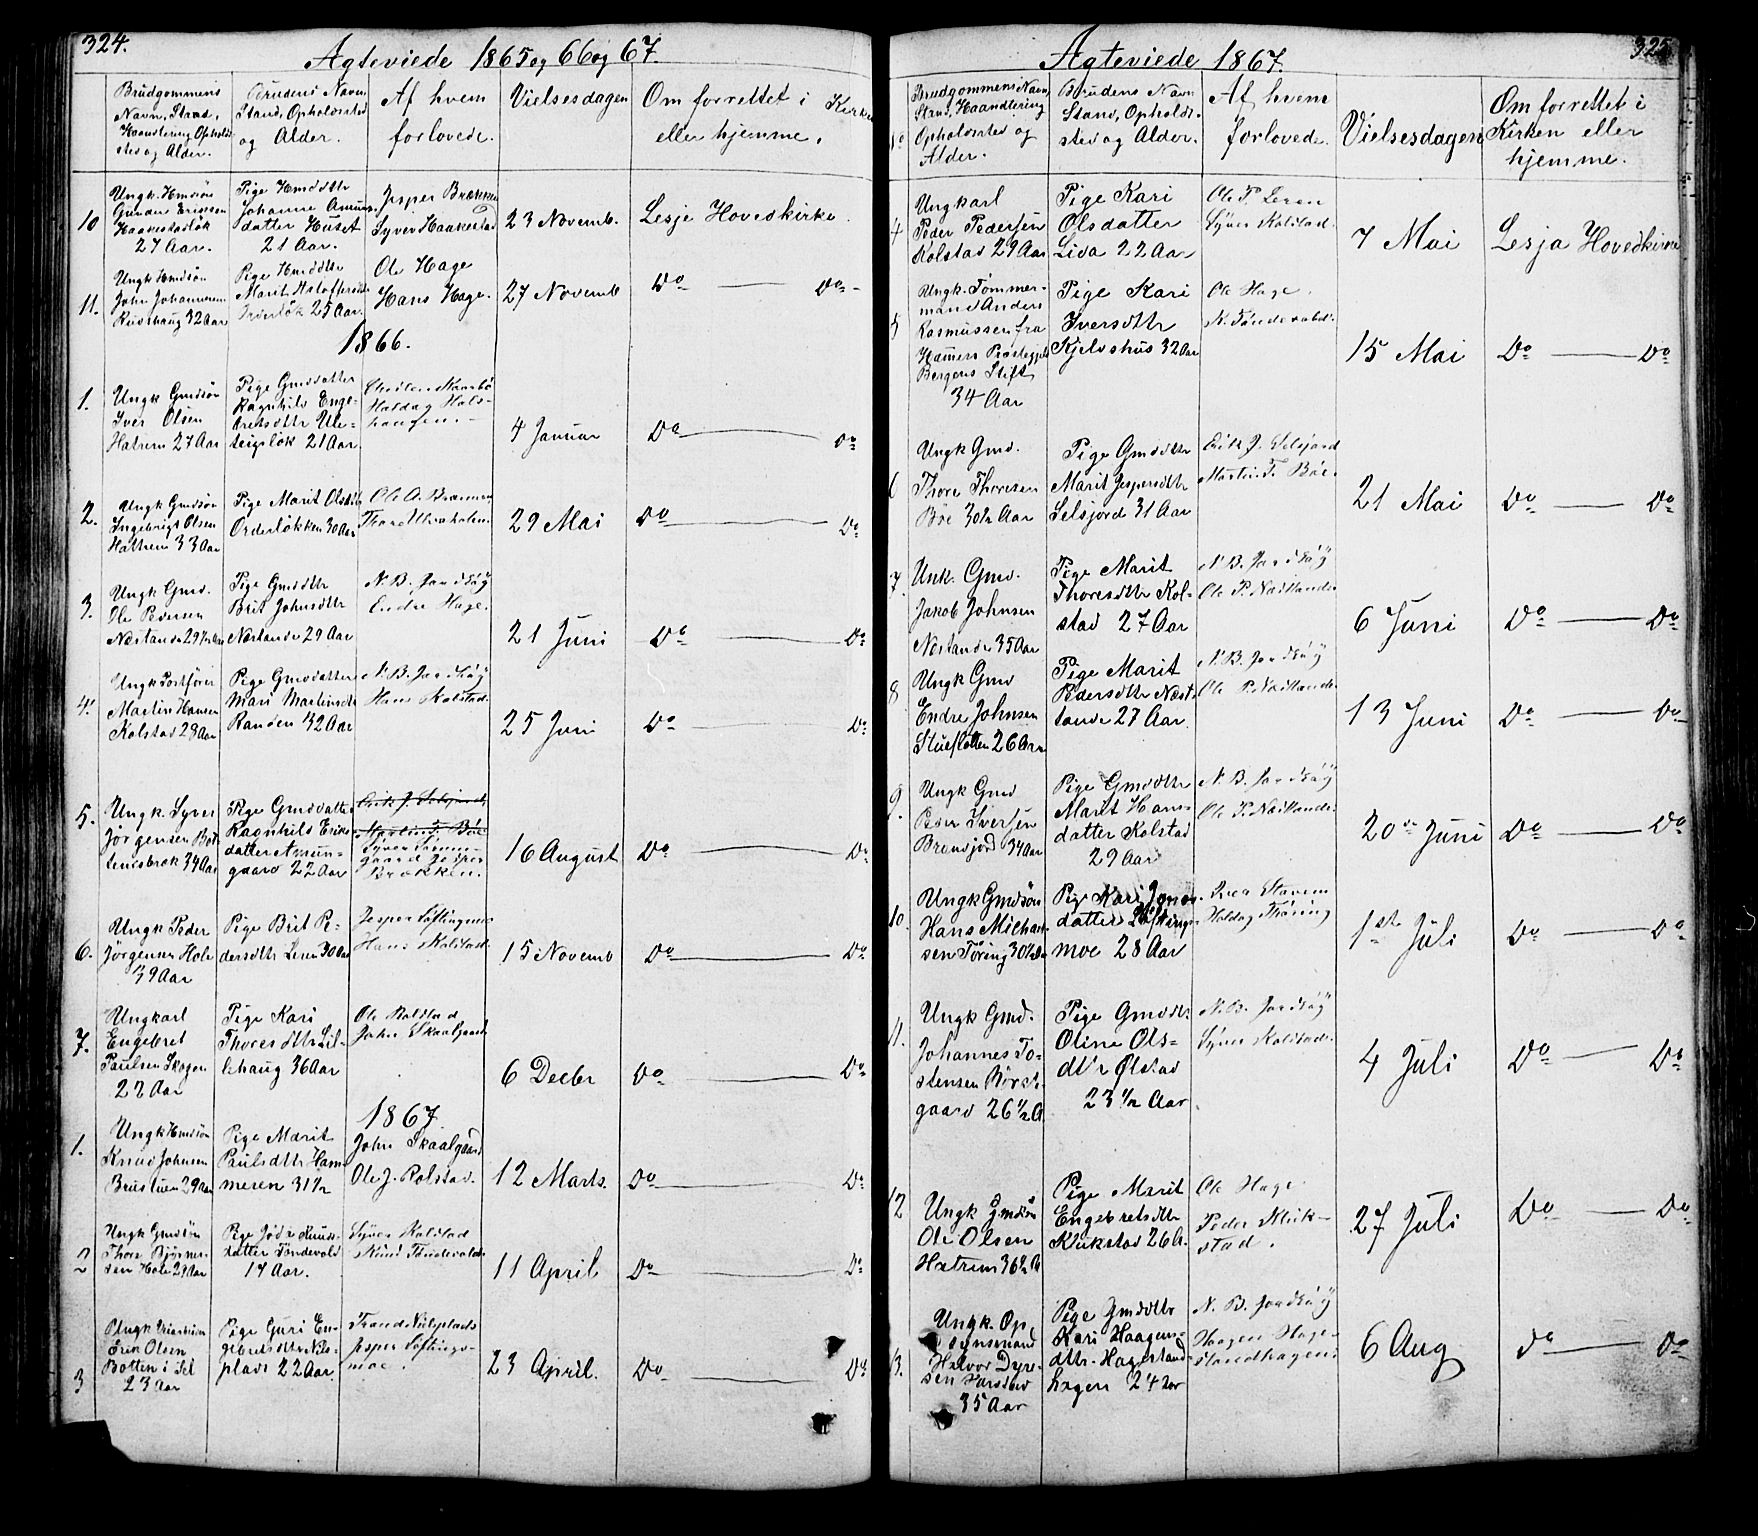 SAH, Lesja prestekontor, Klokkerbok nr. 5, 1850-1894, s. 324-325